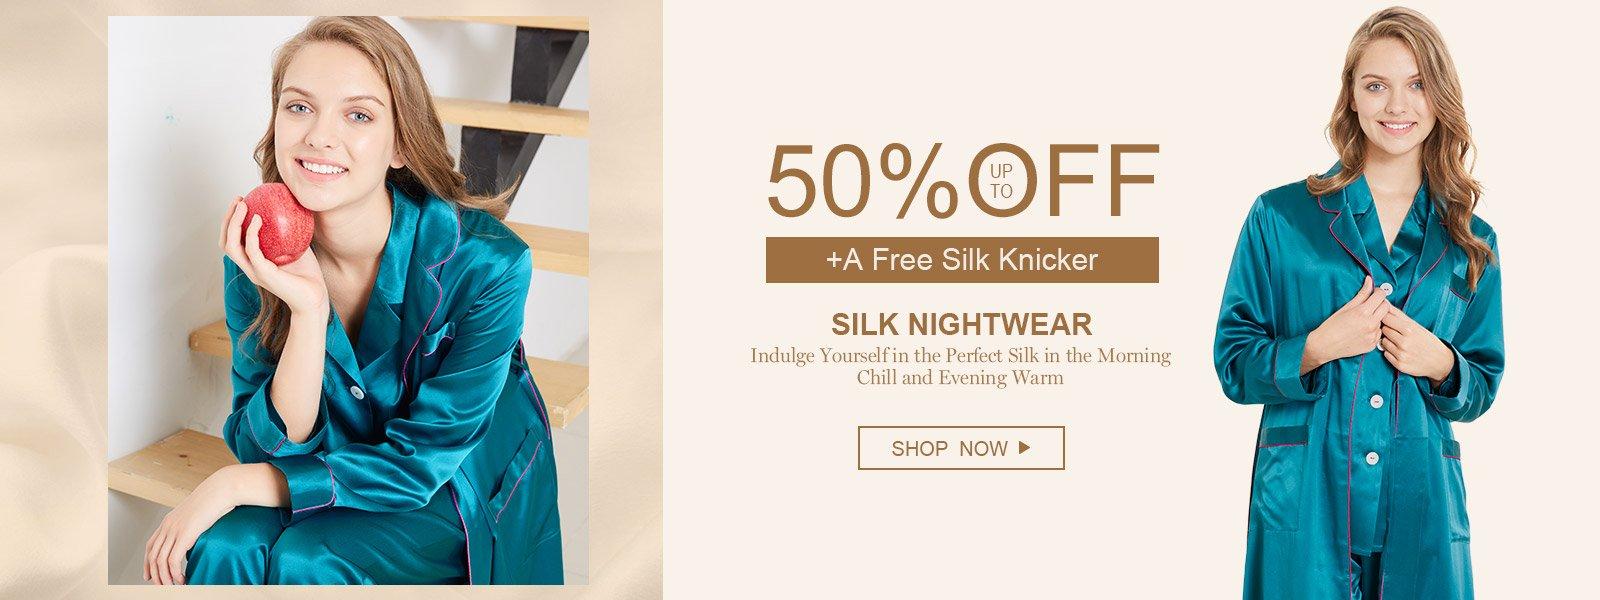 LilySilk LilySilk: up to 50% off silk nightwear